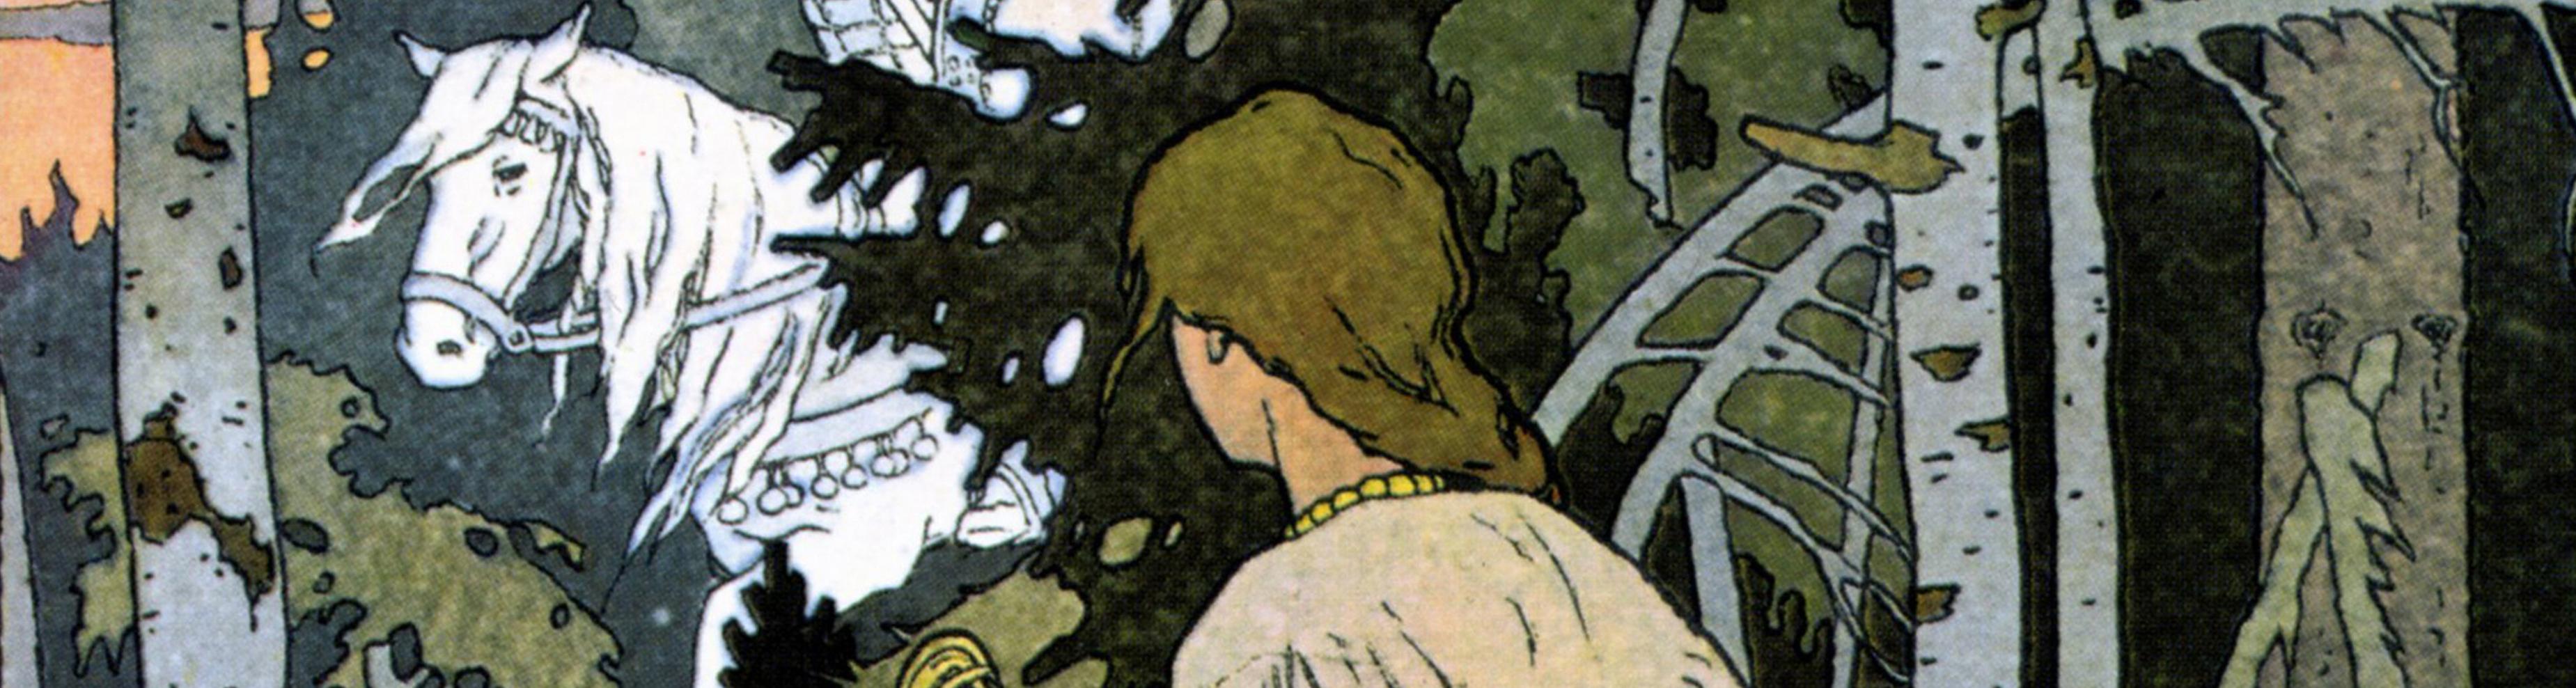 """VASSILISSA LA TRES-BELLE"", illustration de Bilibine (1876-1942)"